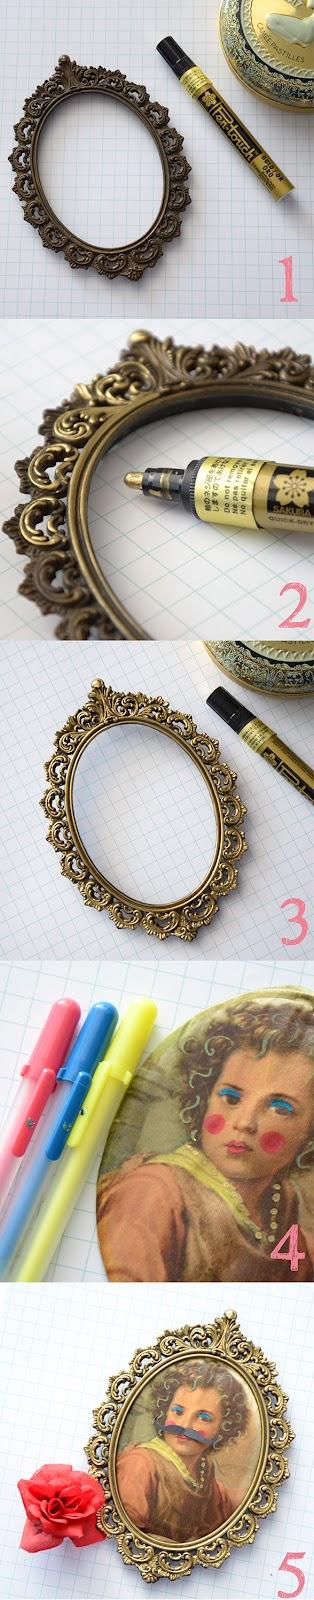 Golden vintage picture frame, painted with a golden Sakura Pen-touch | by www.bloknote.nl | mariekeblokland.blogspot.nl  | by Marieke Blokland